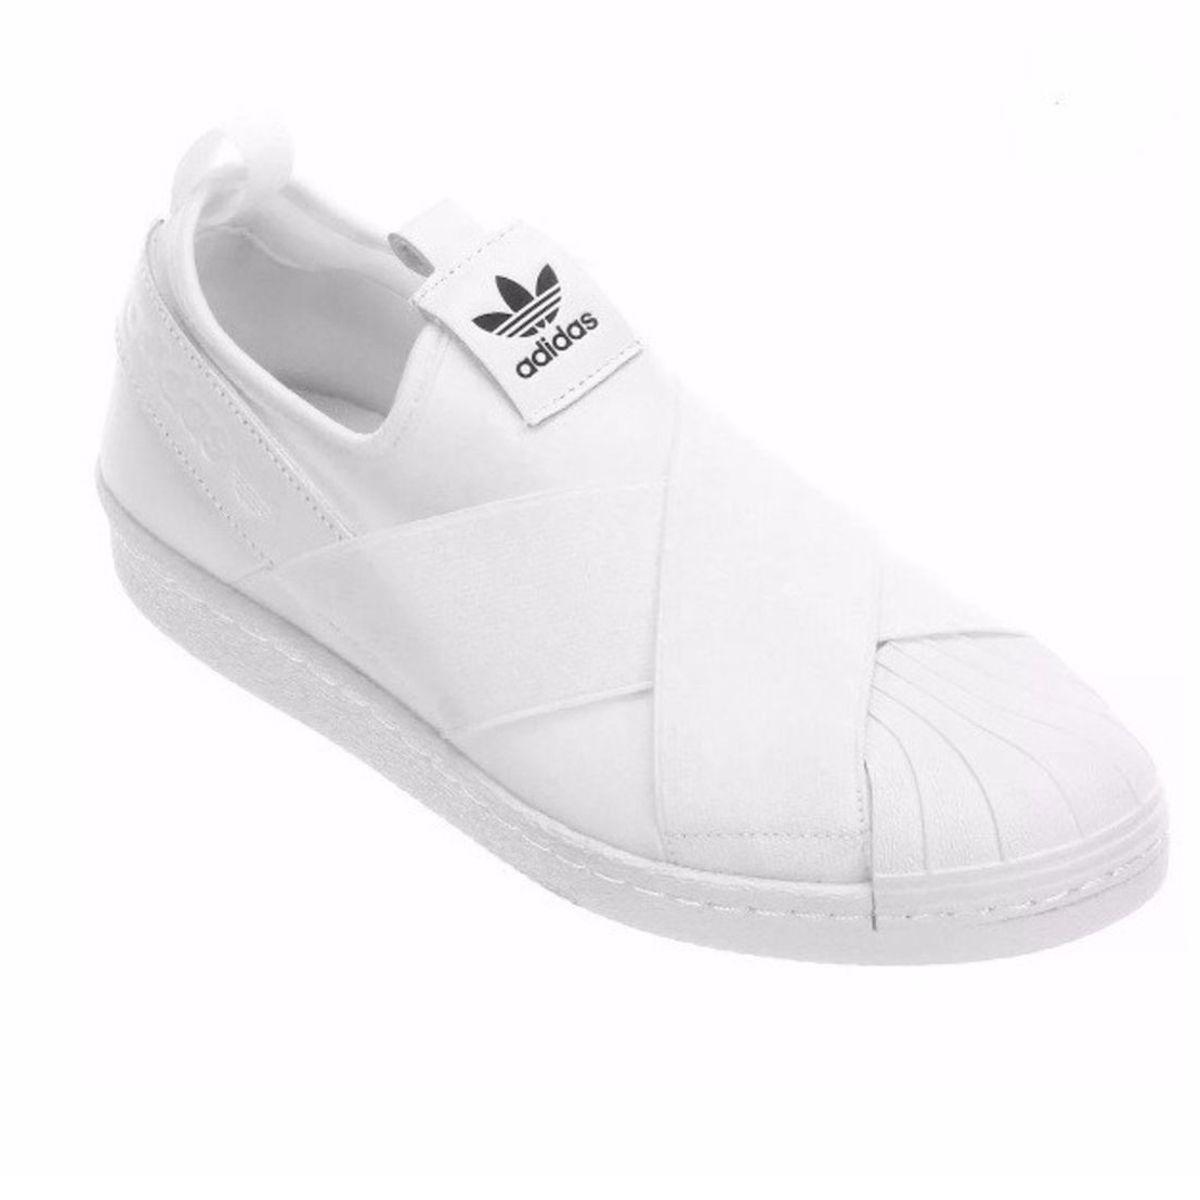 1c4dd8056 Tênis Elastico Adidas Superstar Slip On Branco 37